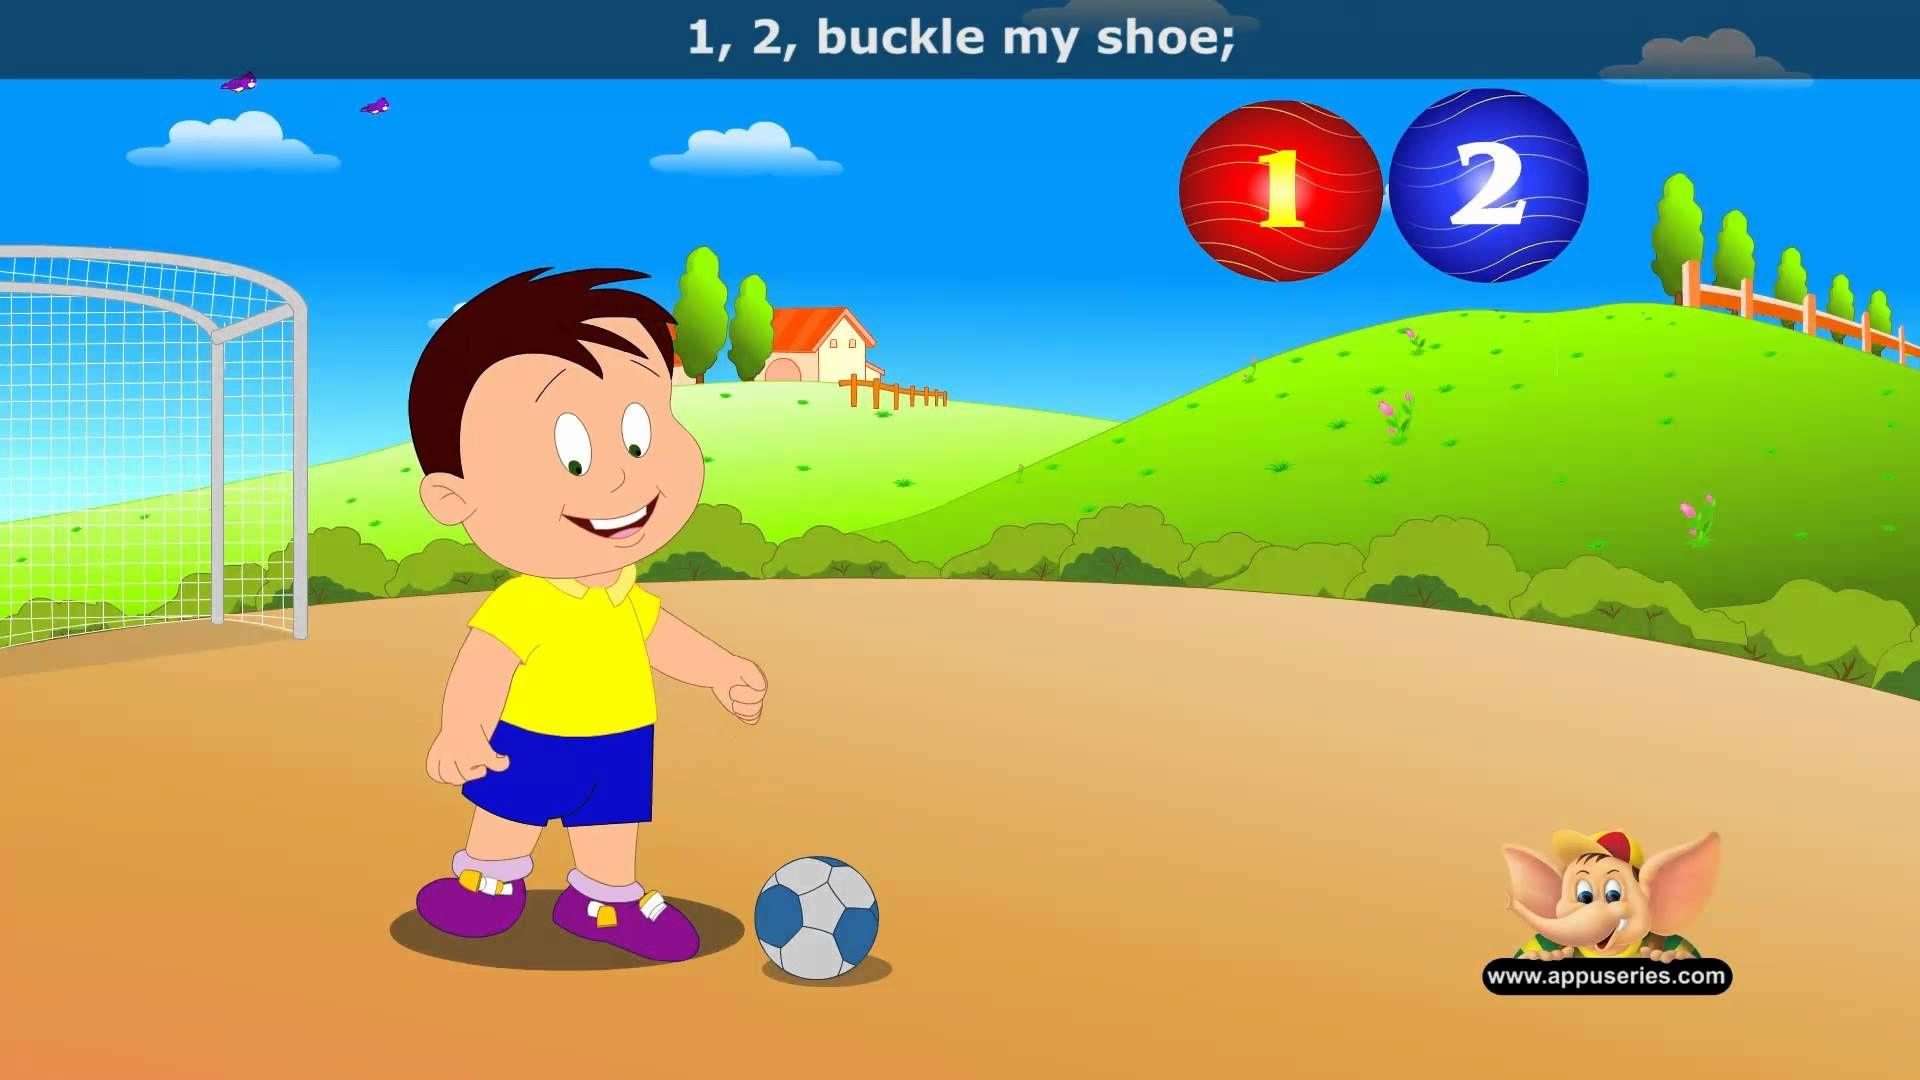 1 2 Buckle My Shoe